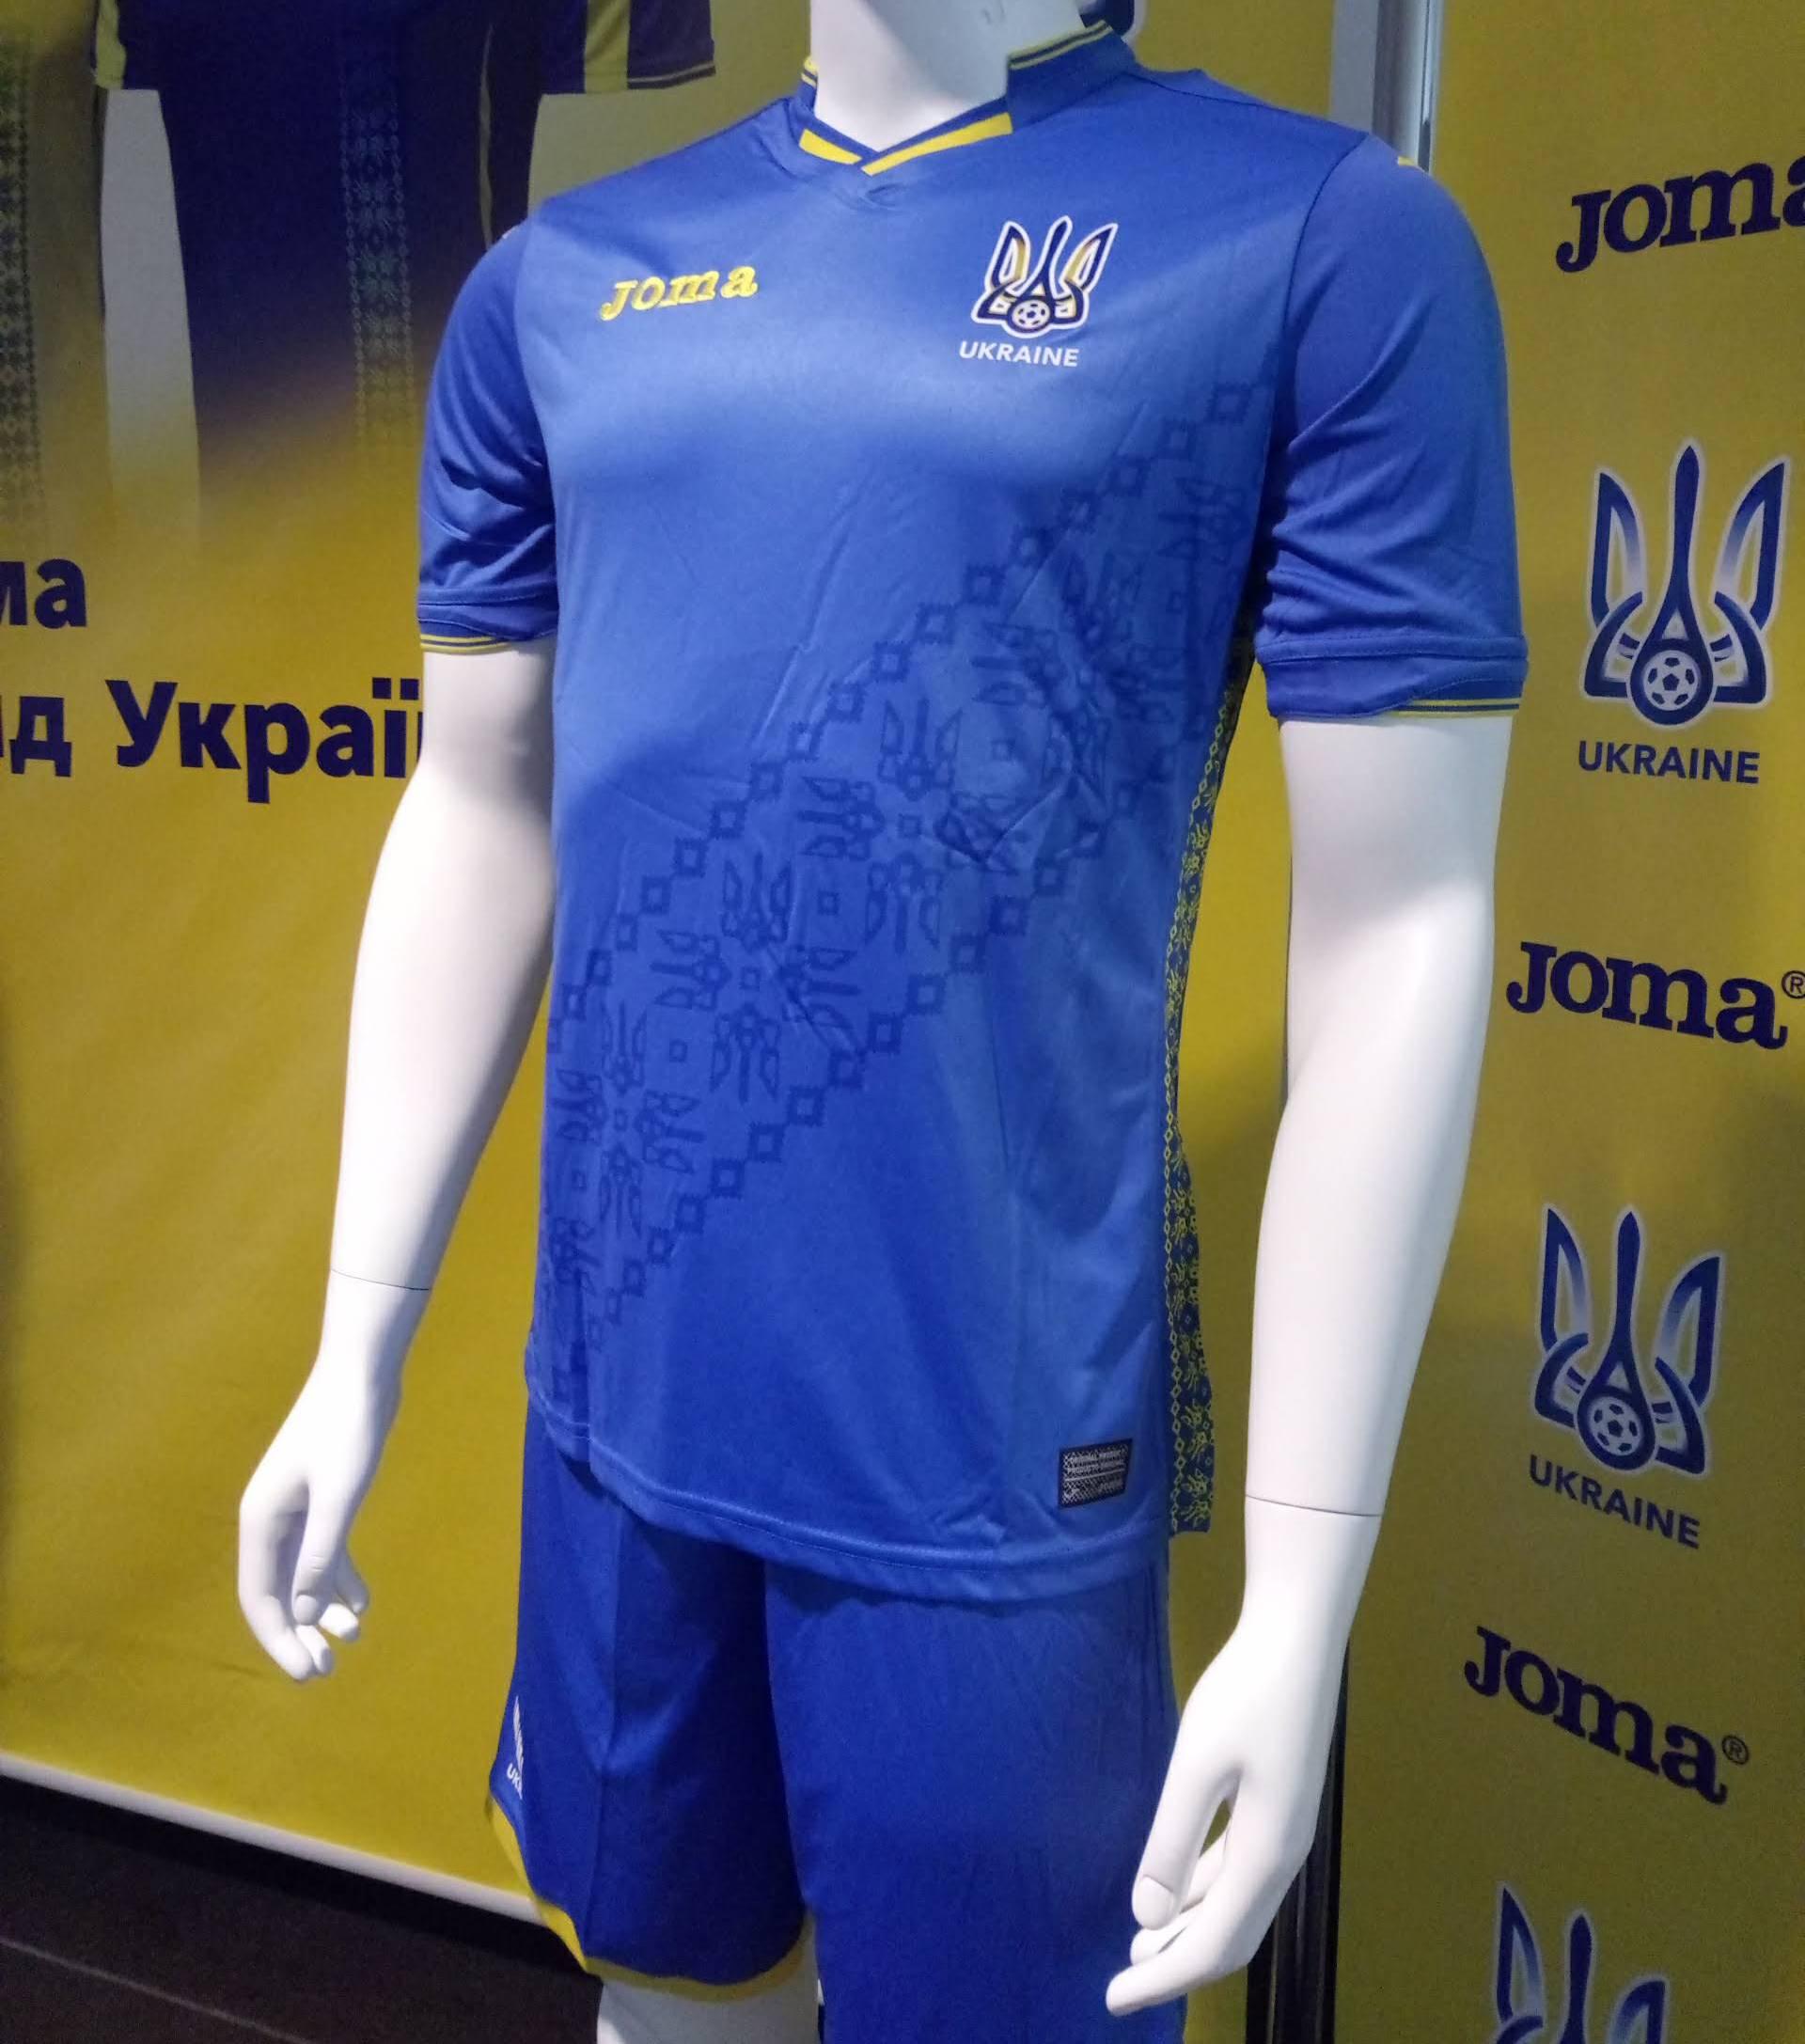 сборная украины 2018